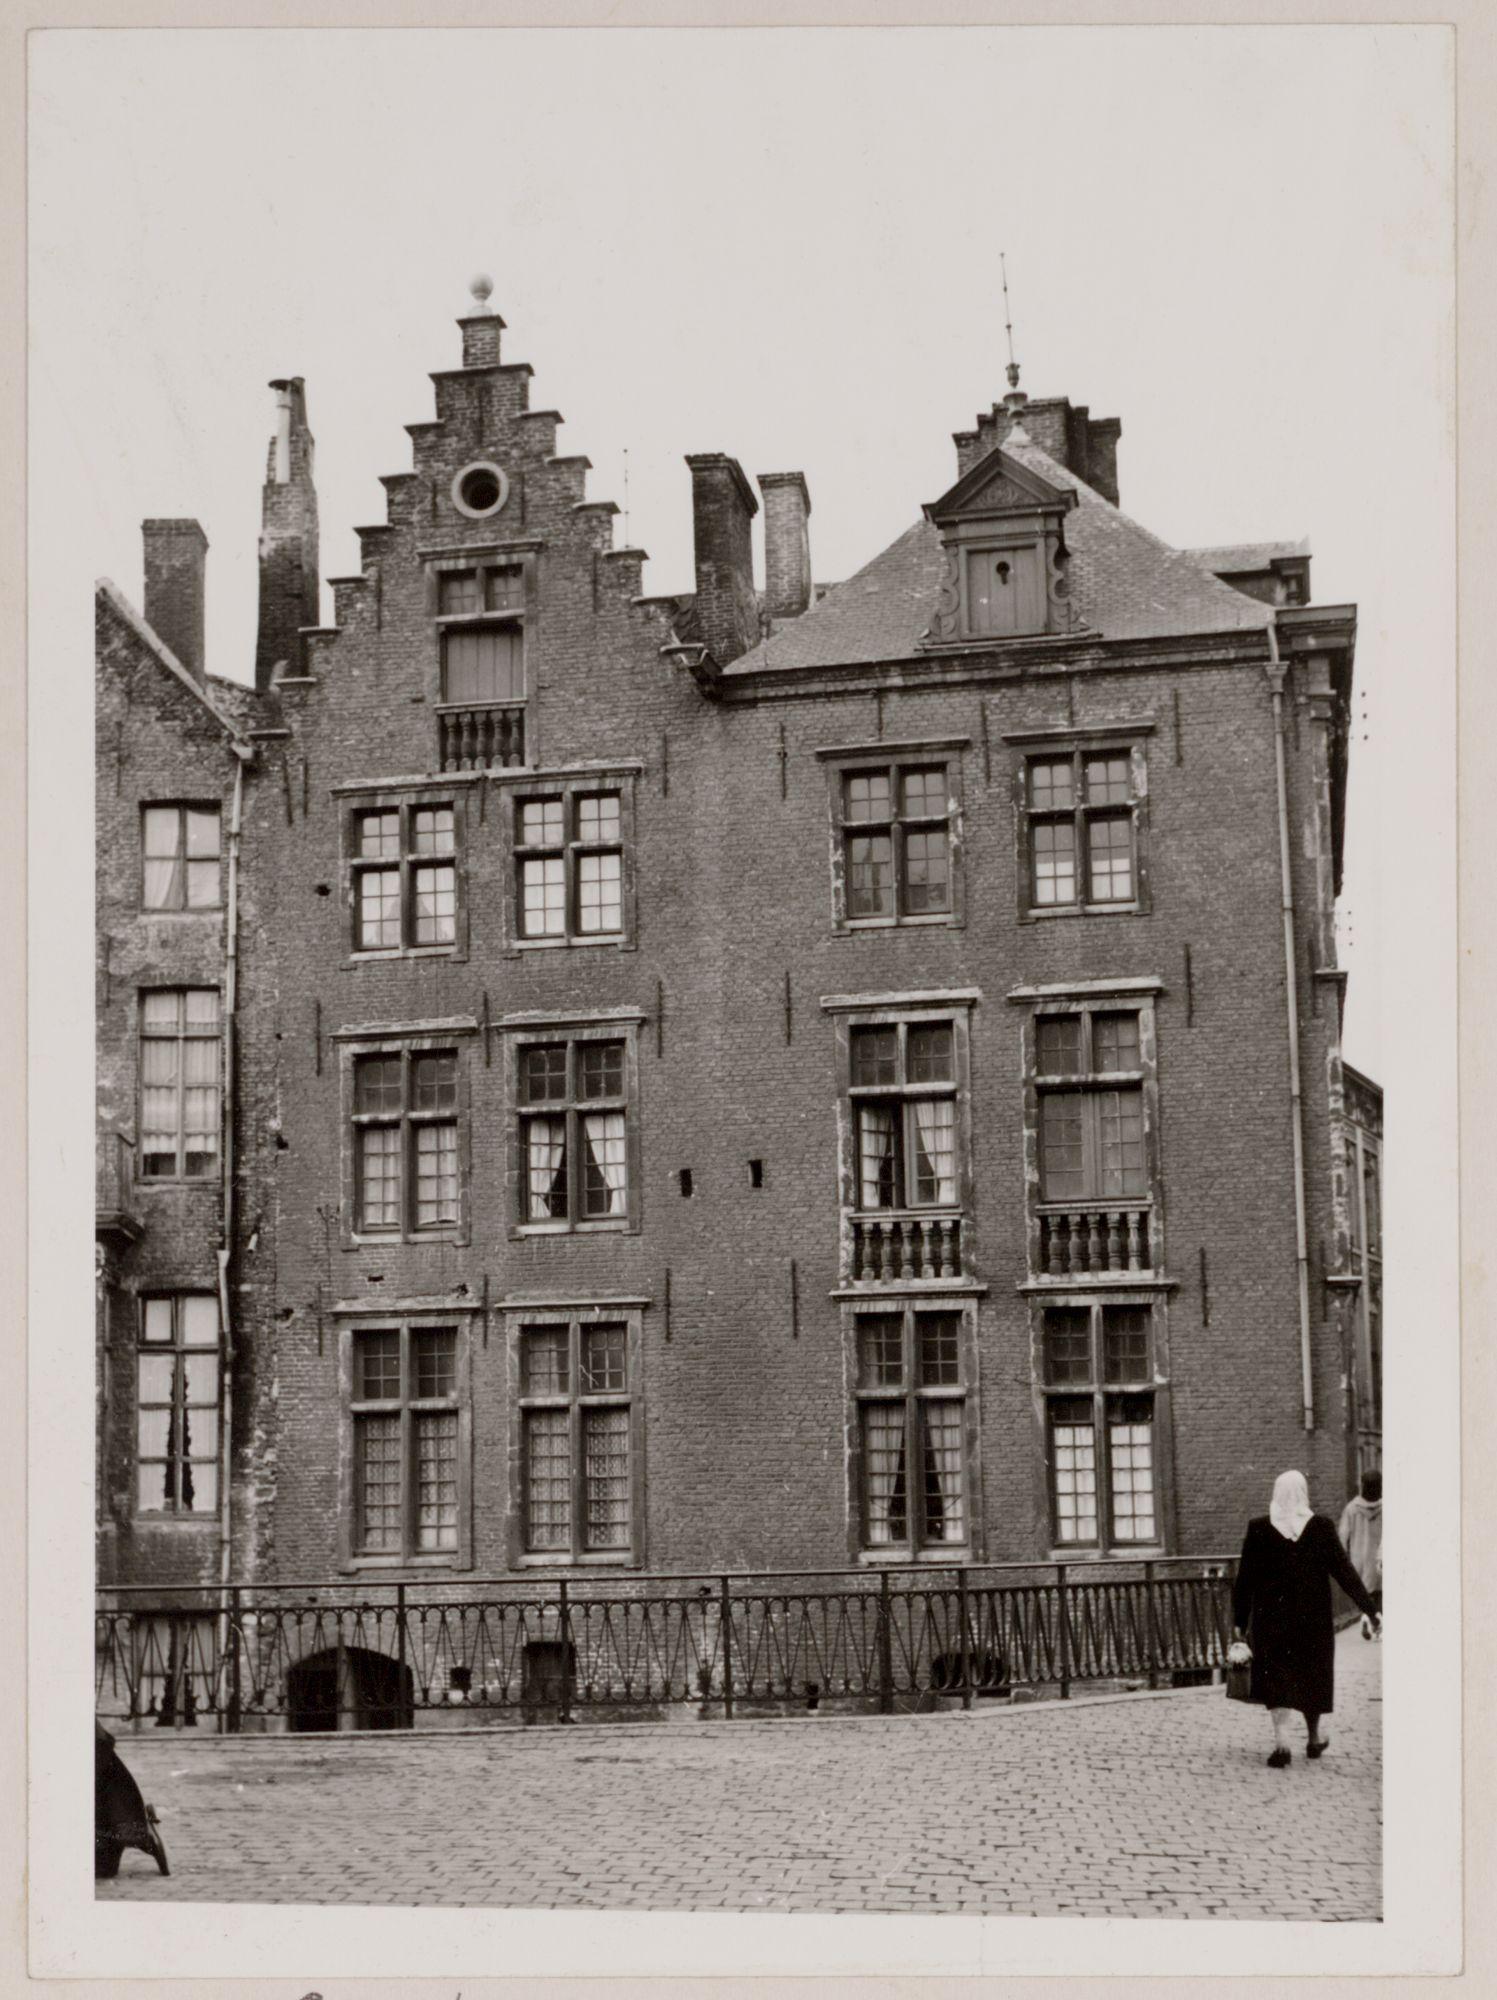 Gent: Hoekhuis Jan Breydelstraat en Rekelingestraat, aan de Lieve